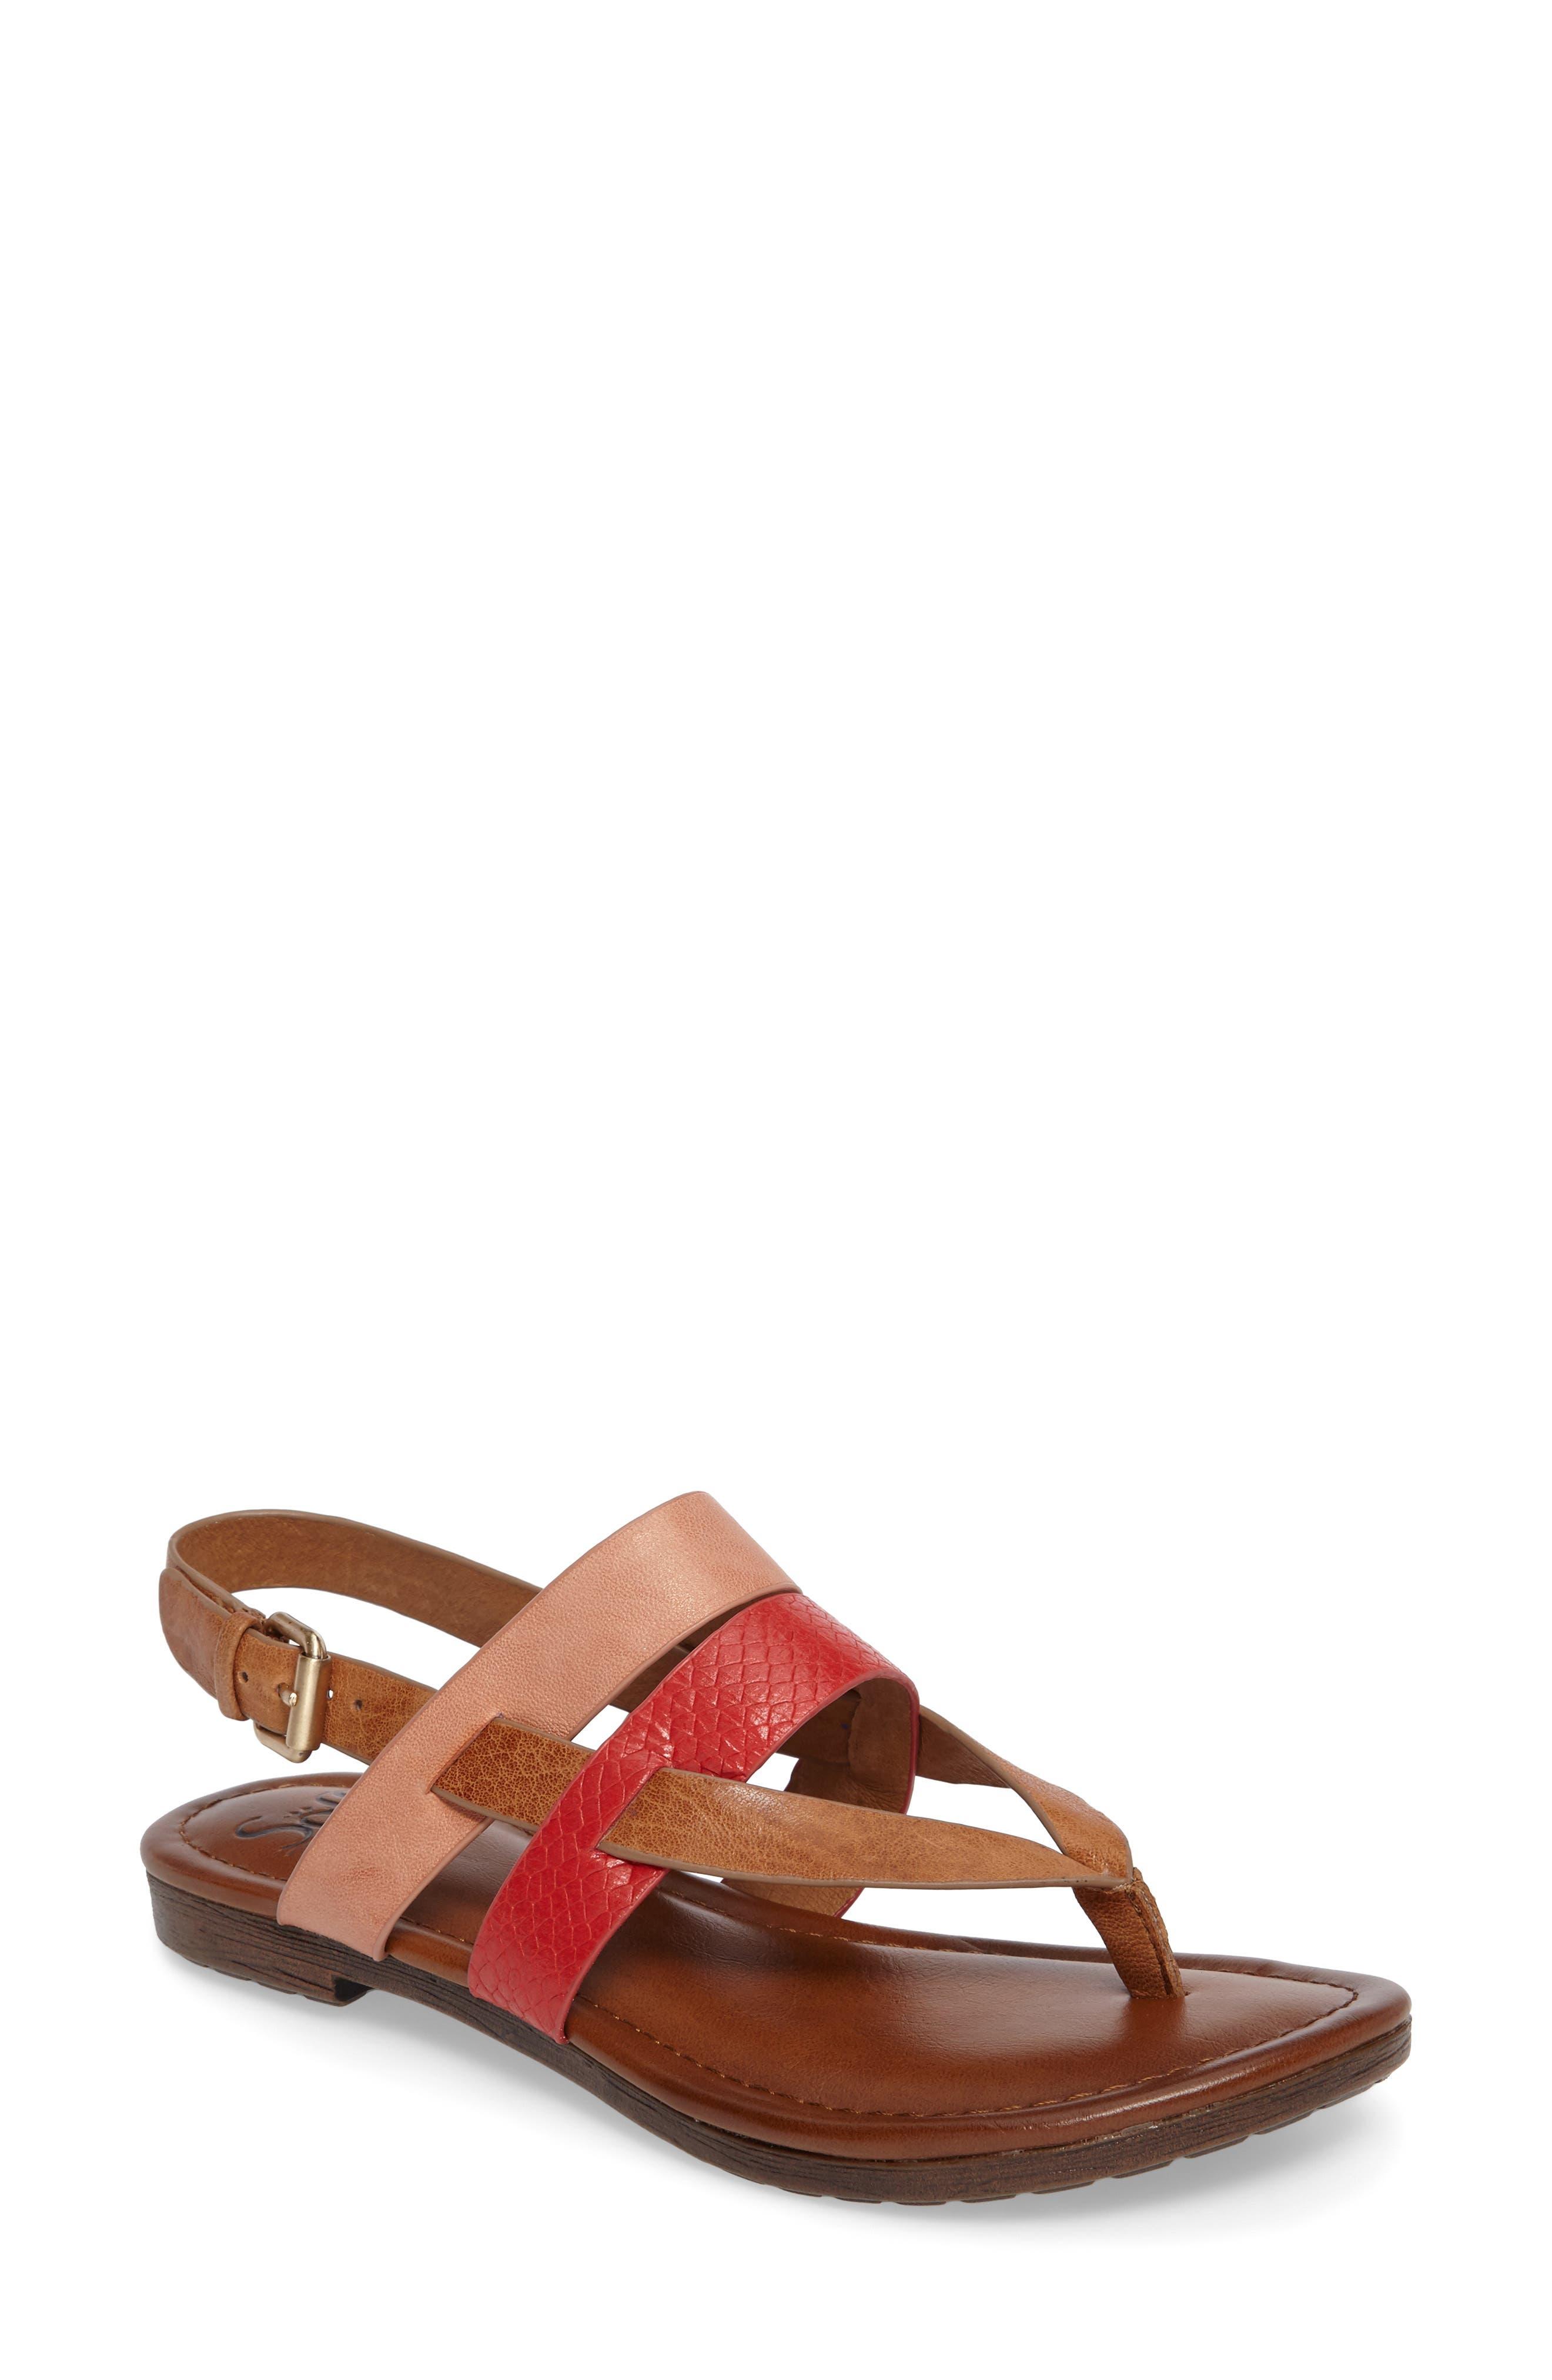 Bena Strappy Sandal,                             Main thumbnail 2, color,